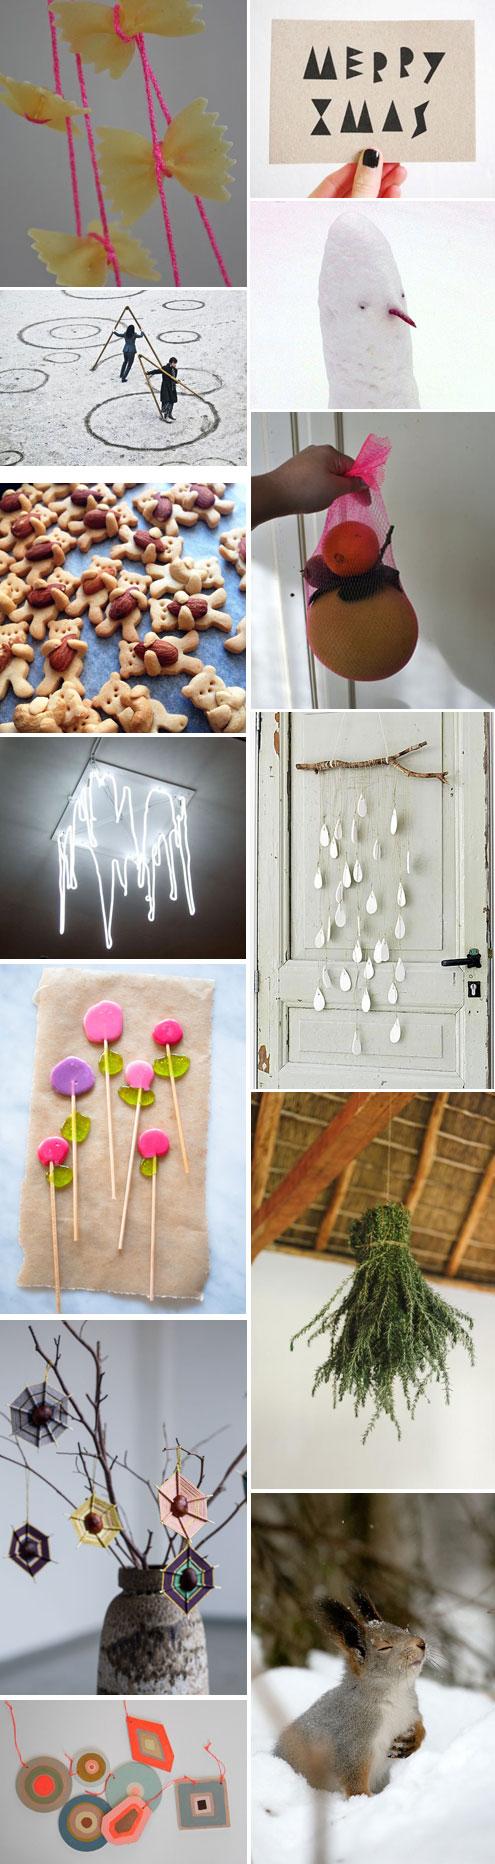 holiday-decor-2014-blog-post-FINAL